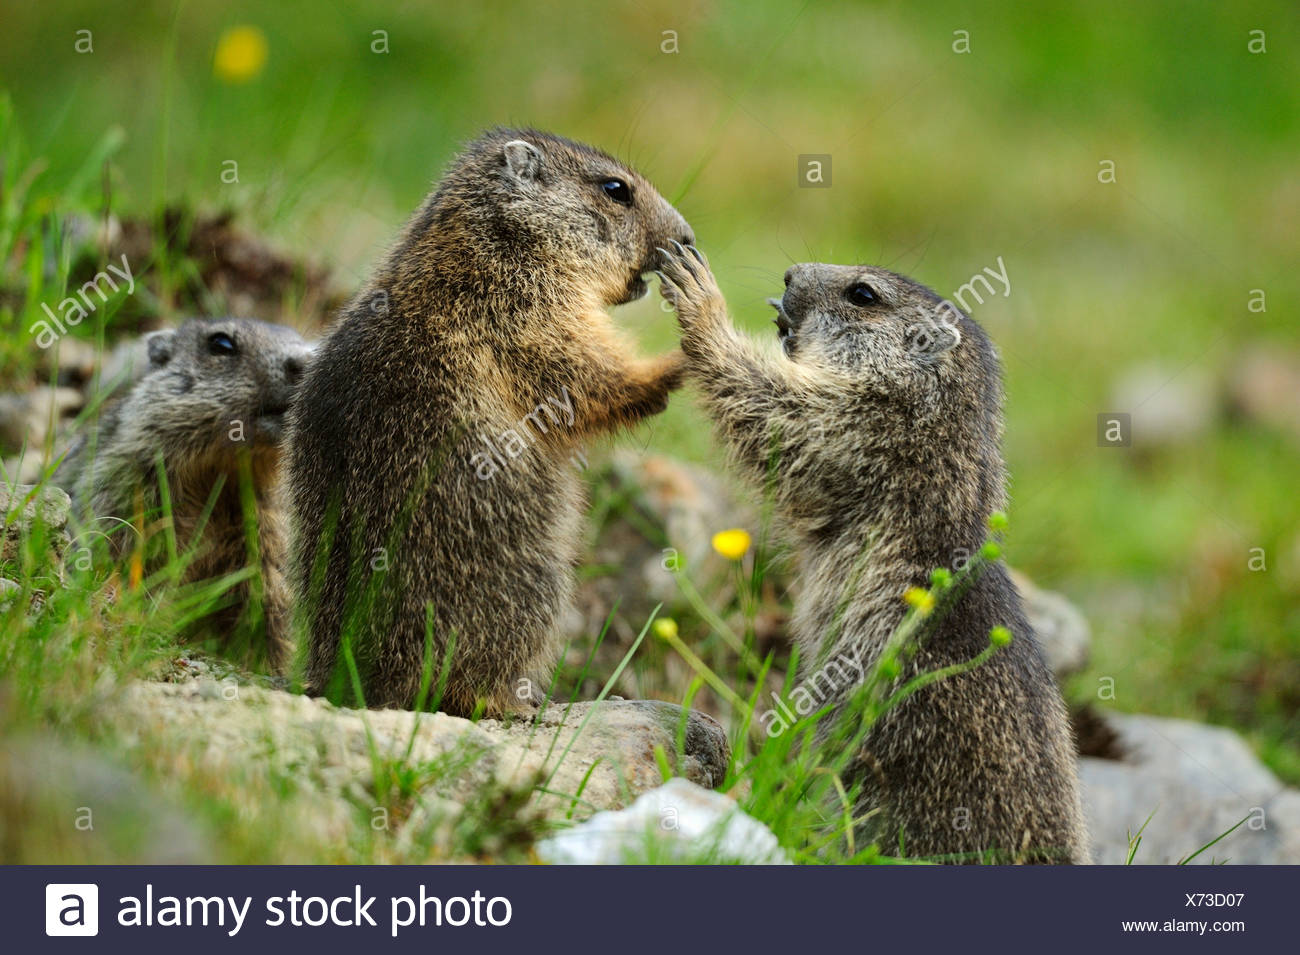 Three Alpine marmots (Marmota marmota), Stubai, Stubai Alps, Tyrol, Austria - Stock Image